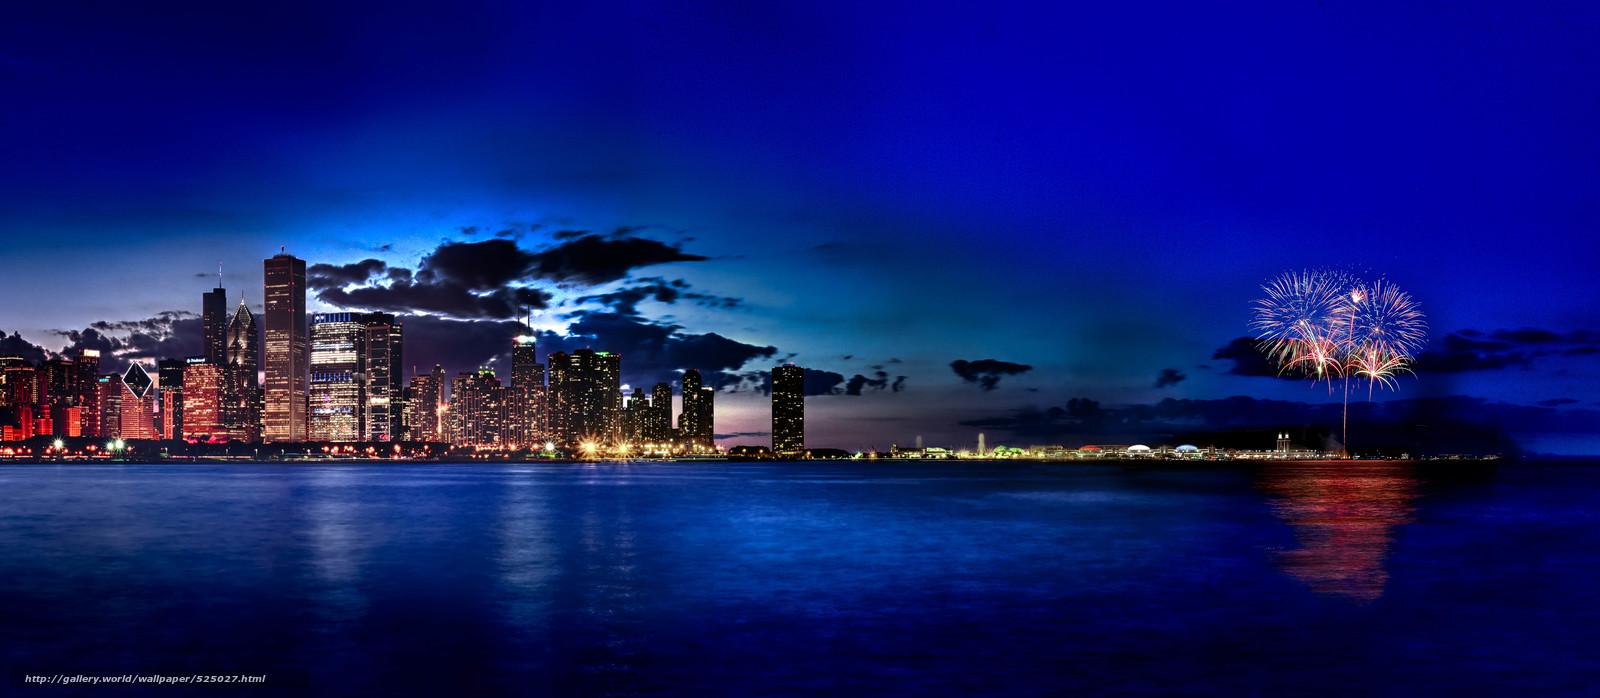 navy pier chicago wallpaper - photo #15